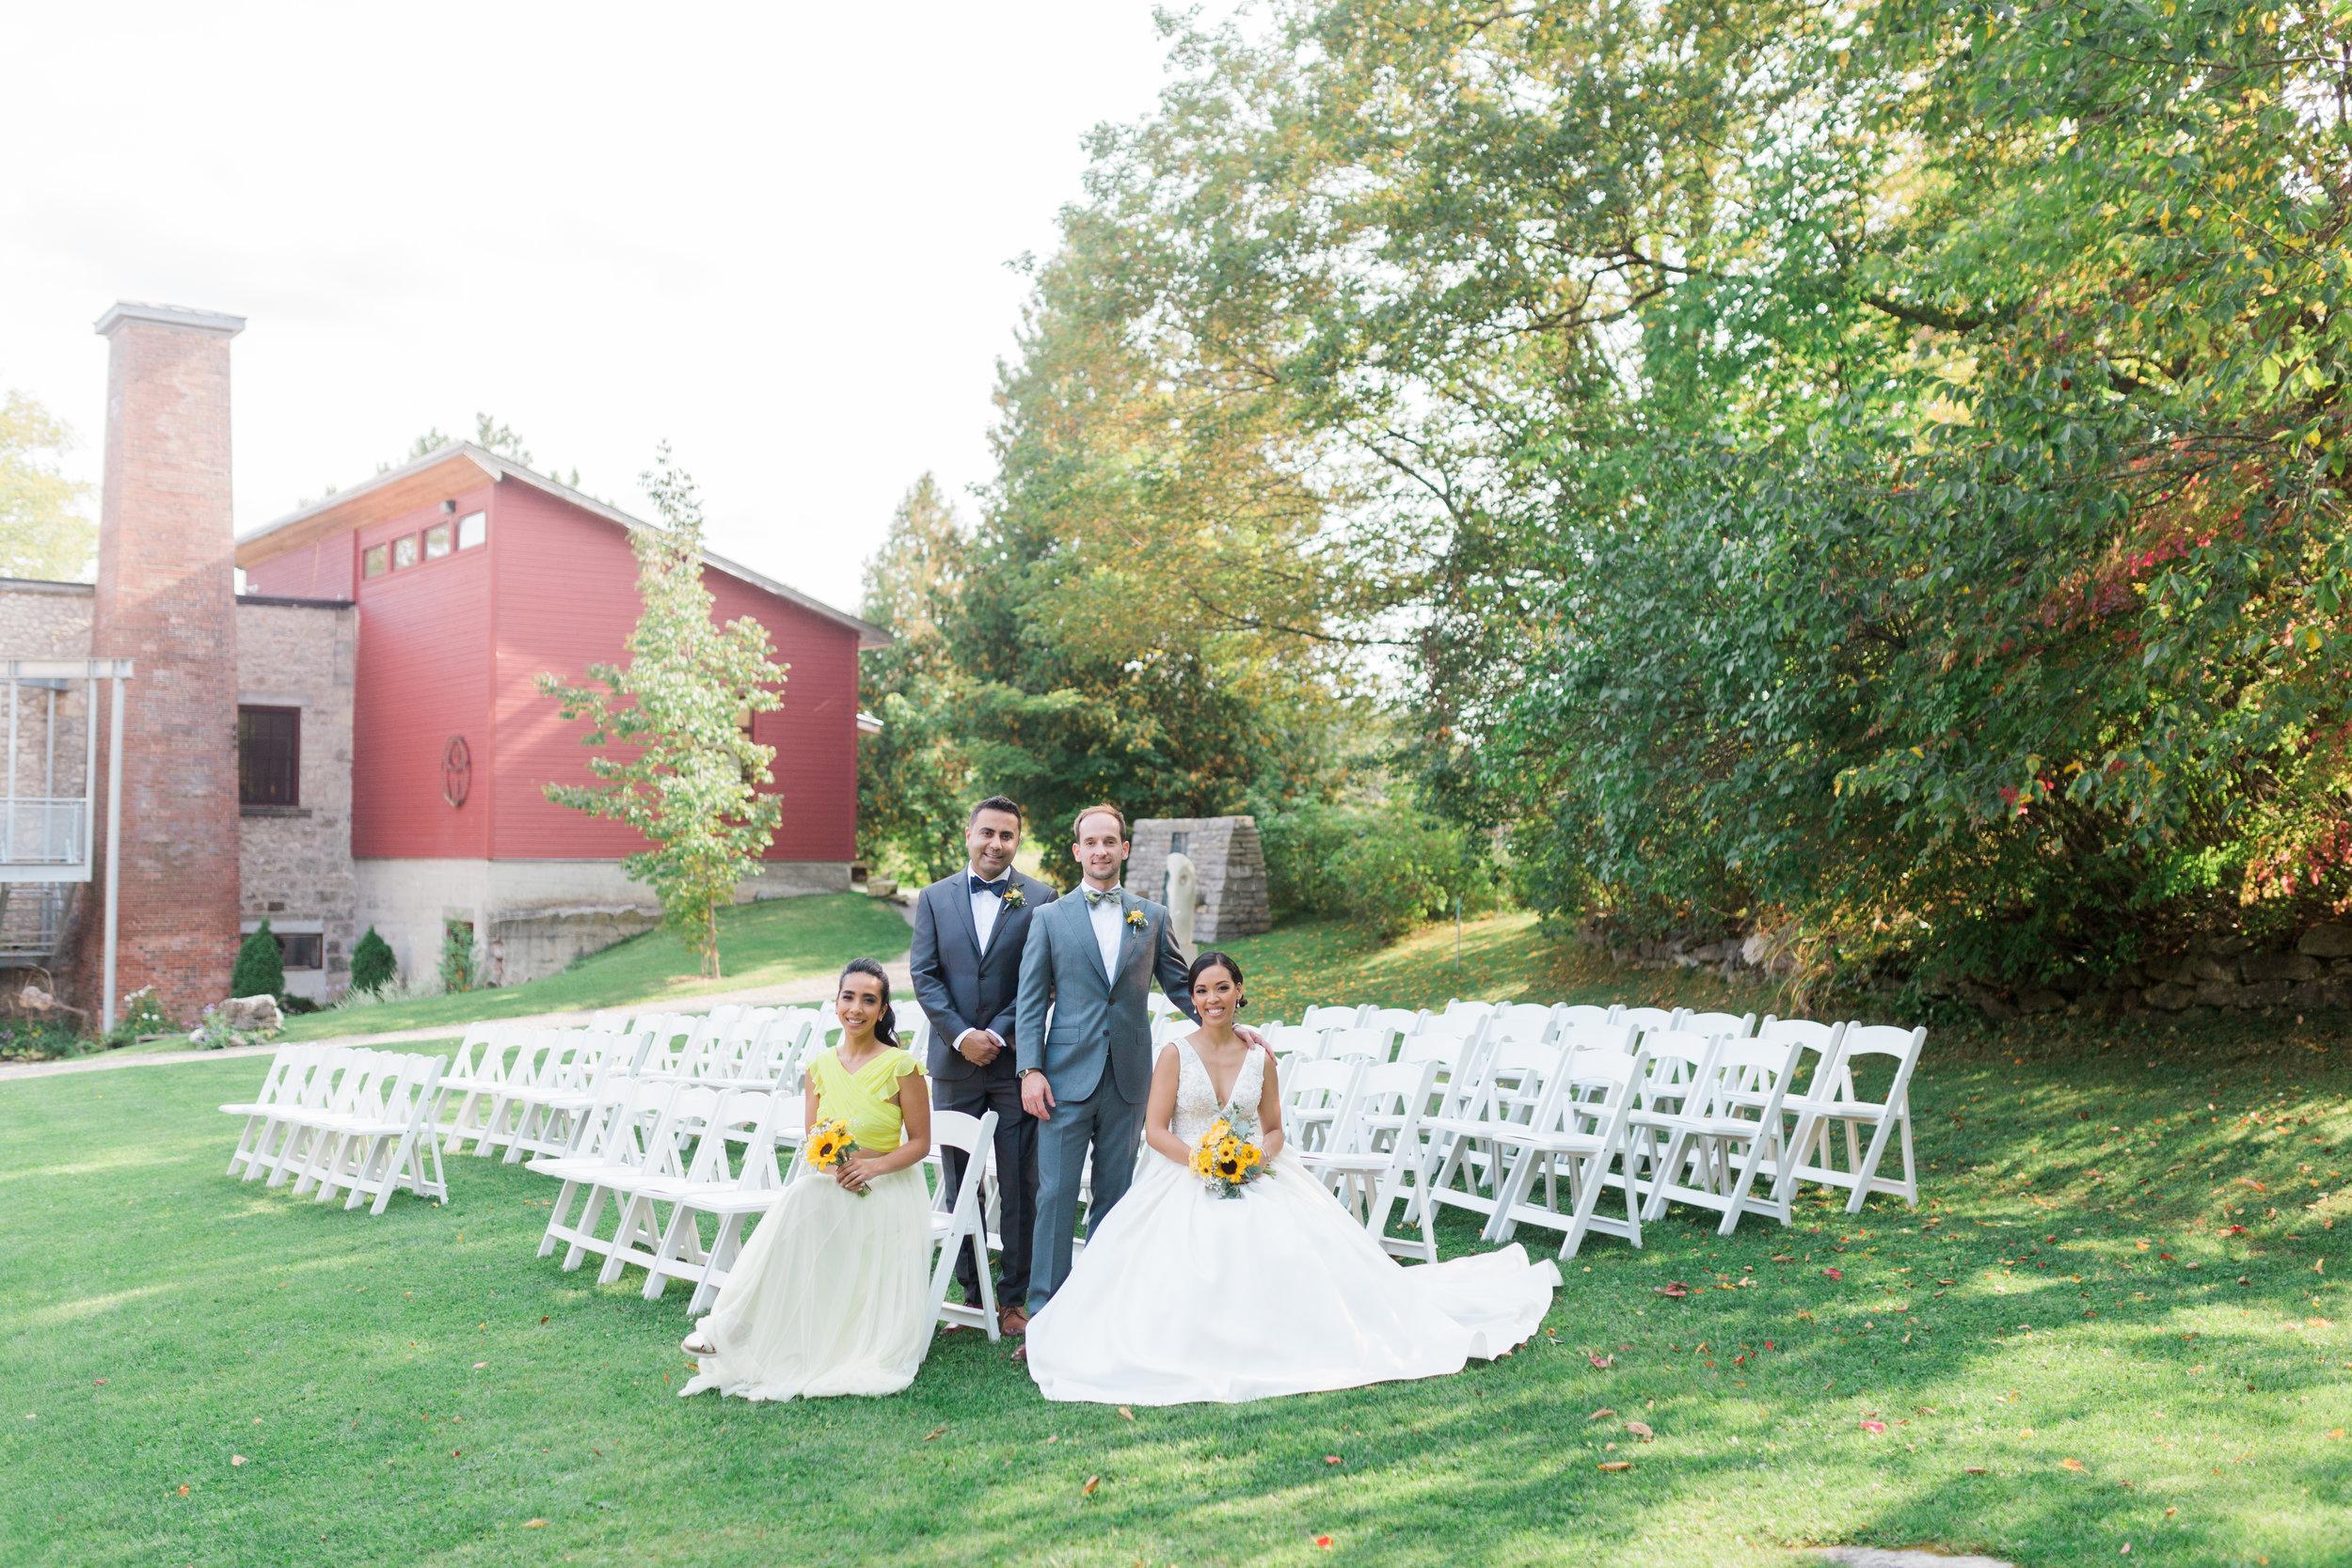 Alton Mills Wedding - Portraits-4.jpg